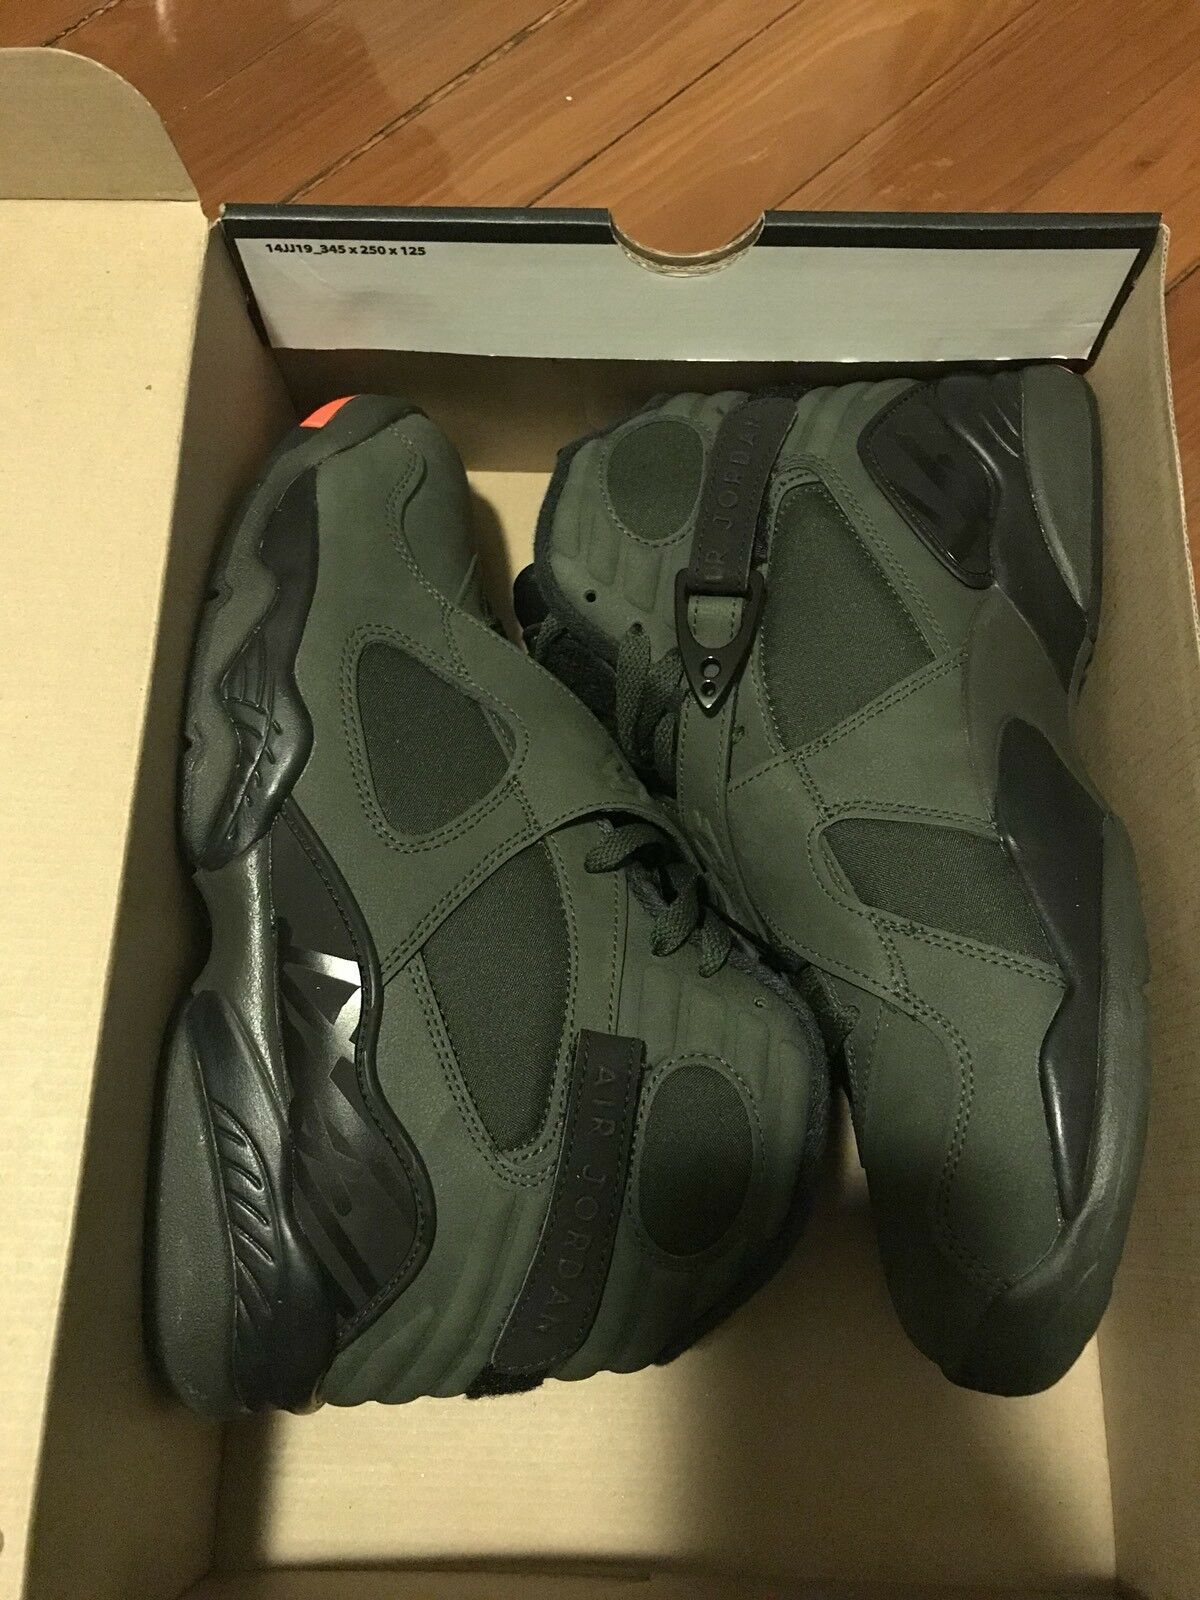 Nike Air Jordan 8 Retro Sequoia Eminem Undftd IV Sz 9 Receipt